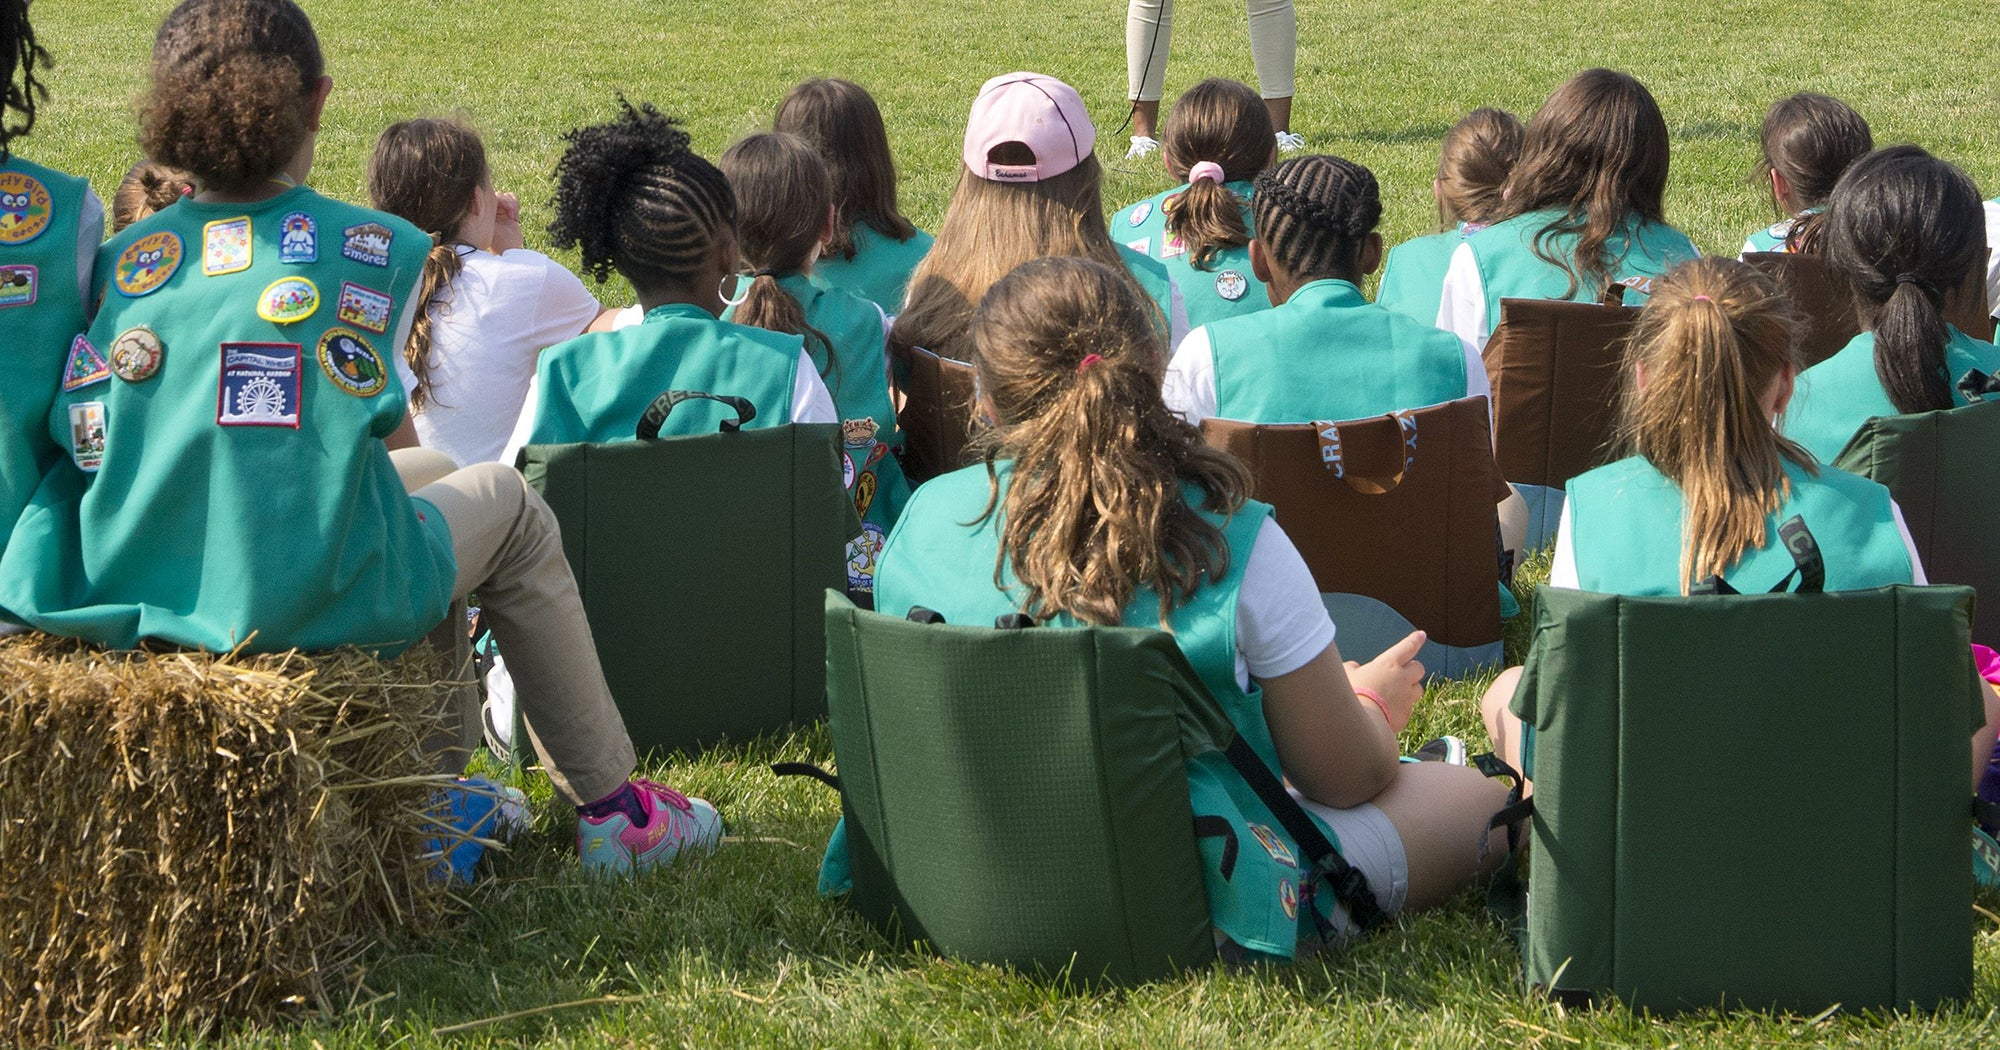 The Girl Scouts Are Under Fire For Congratulating Amy Coney Barrett